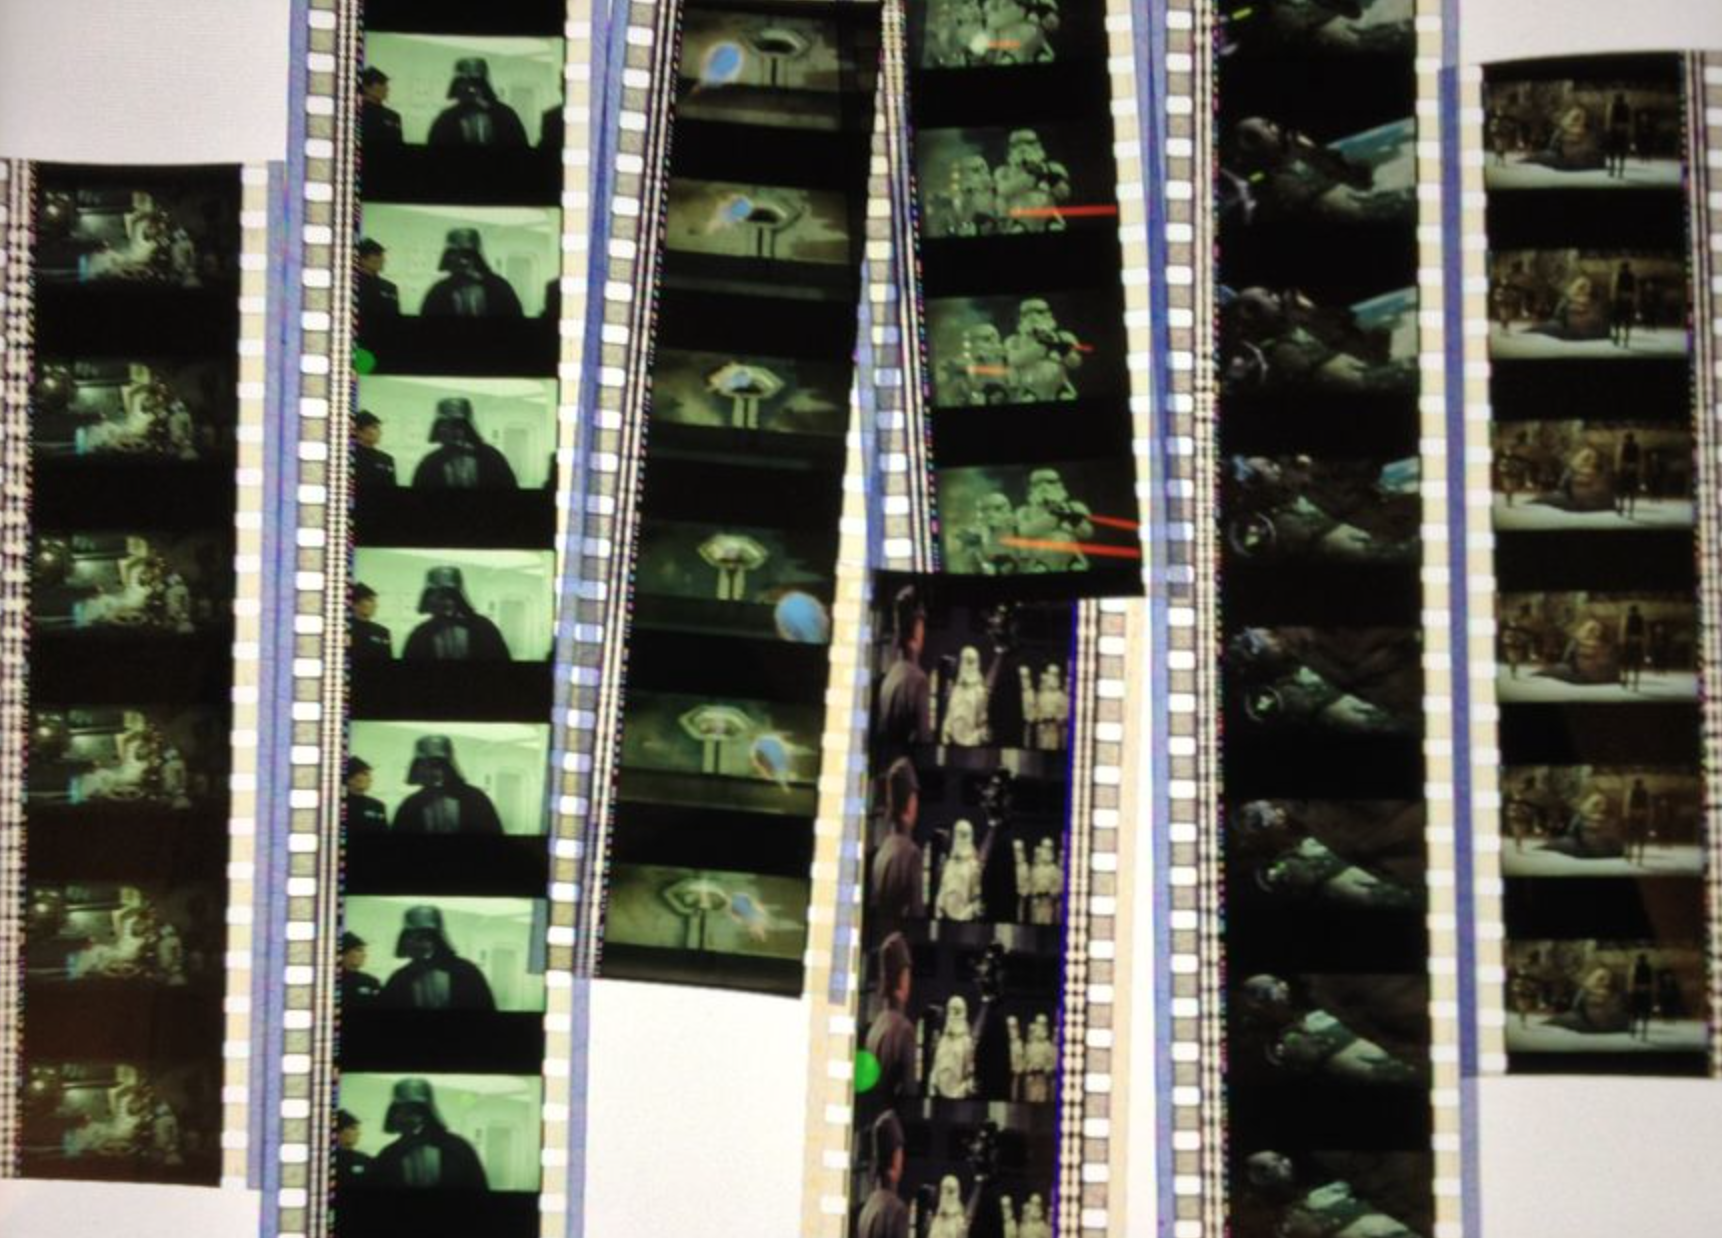 Kitbashed: The Film